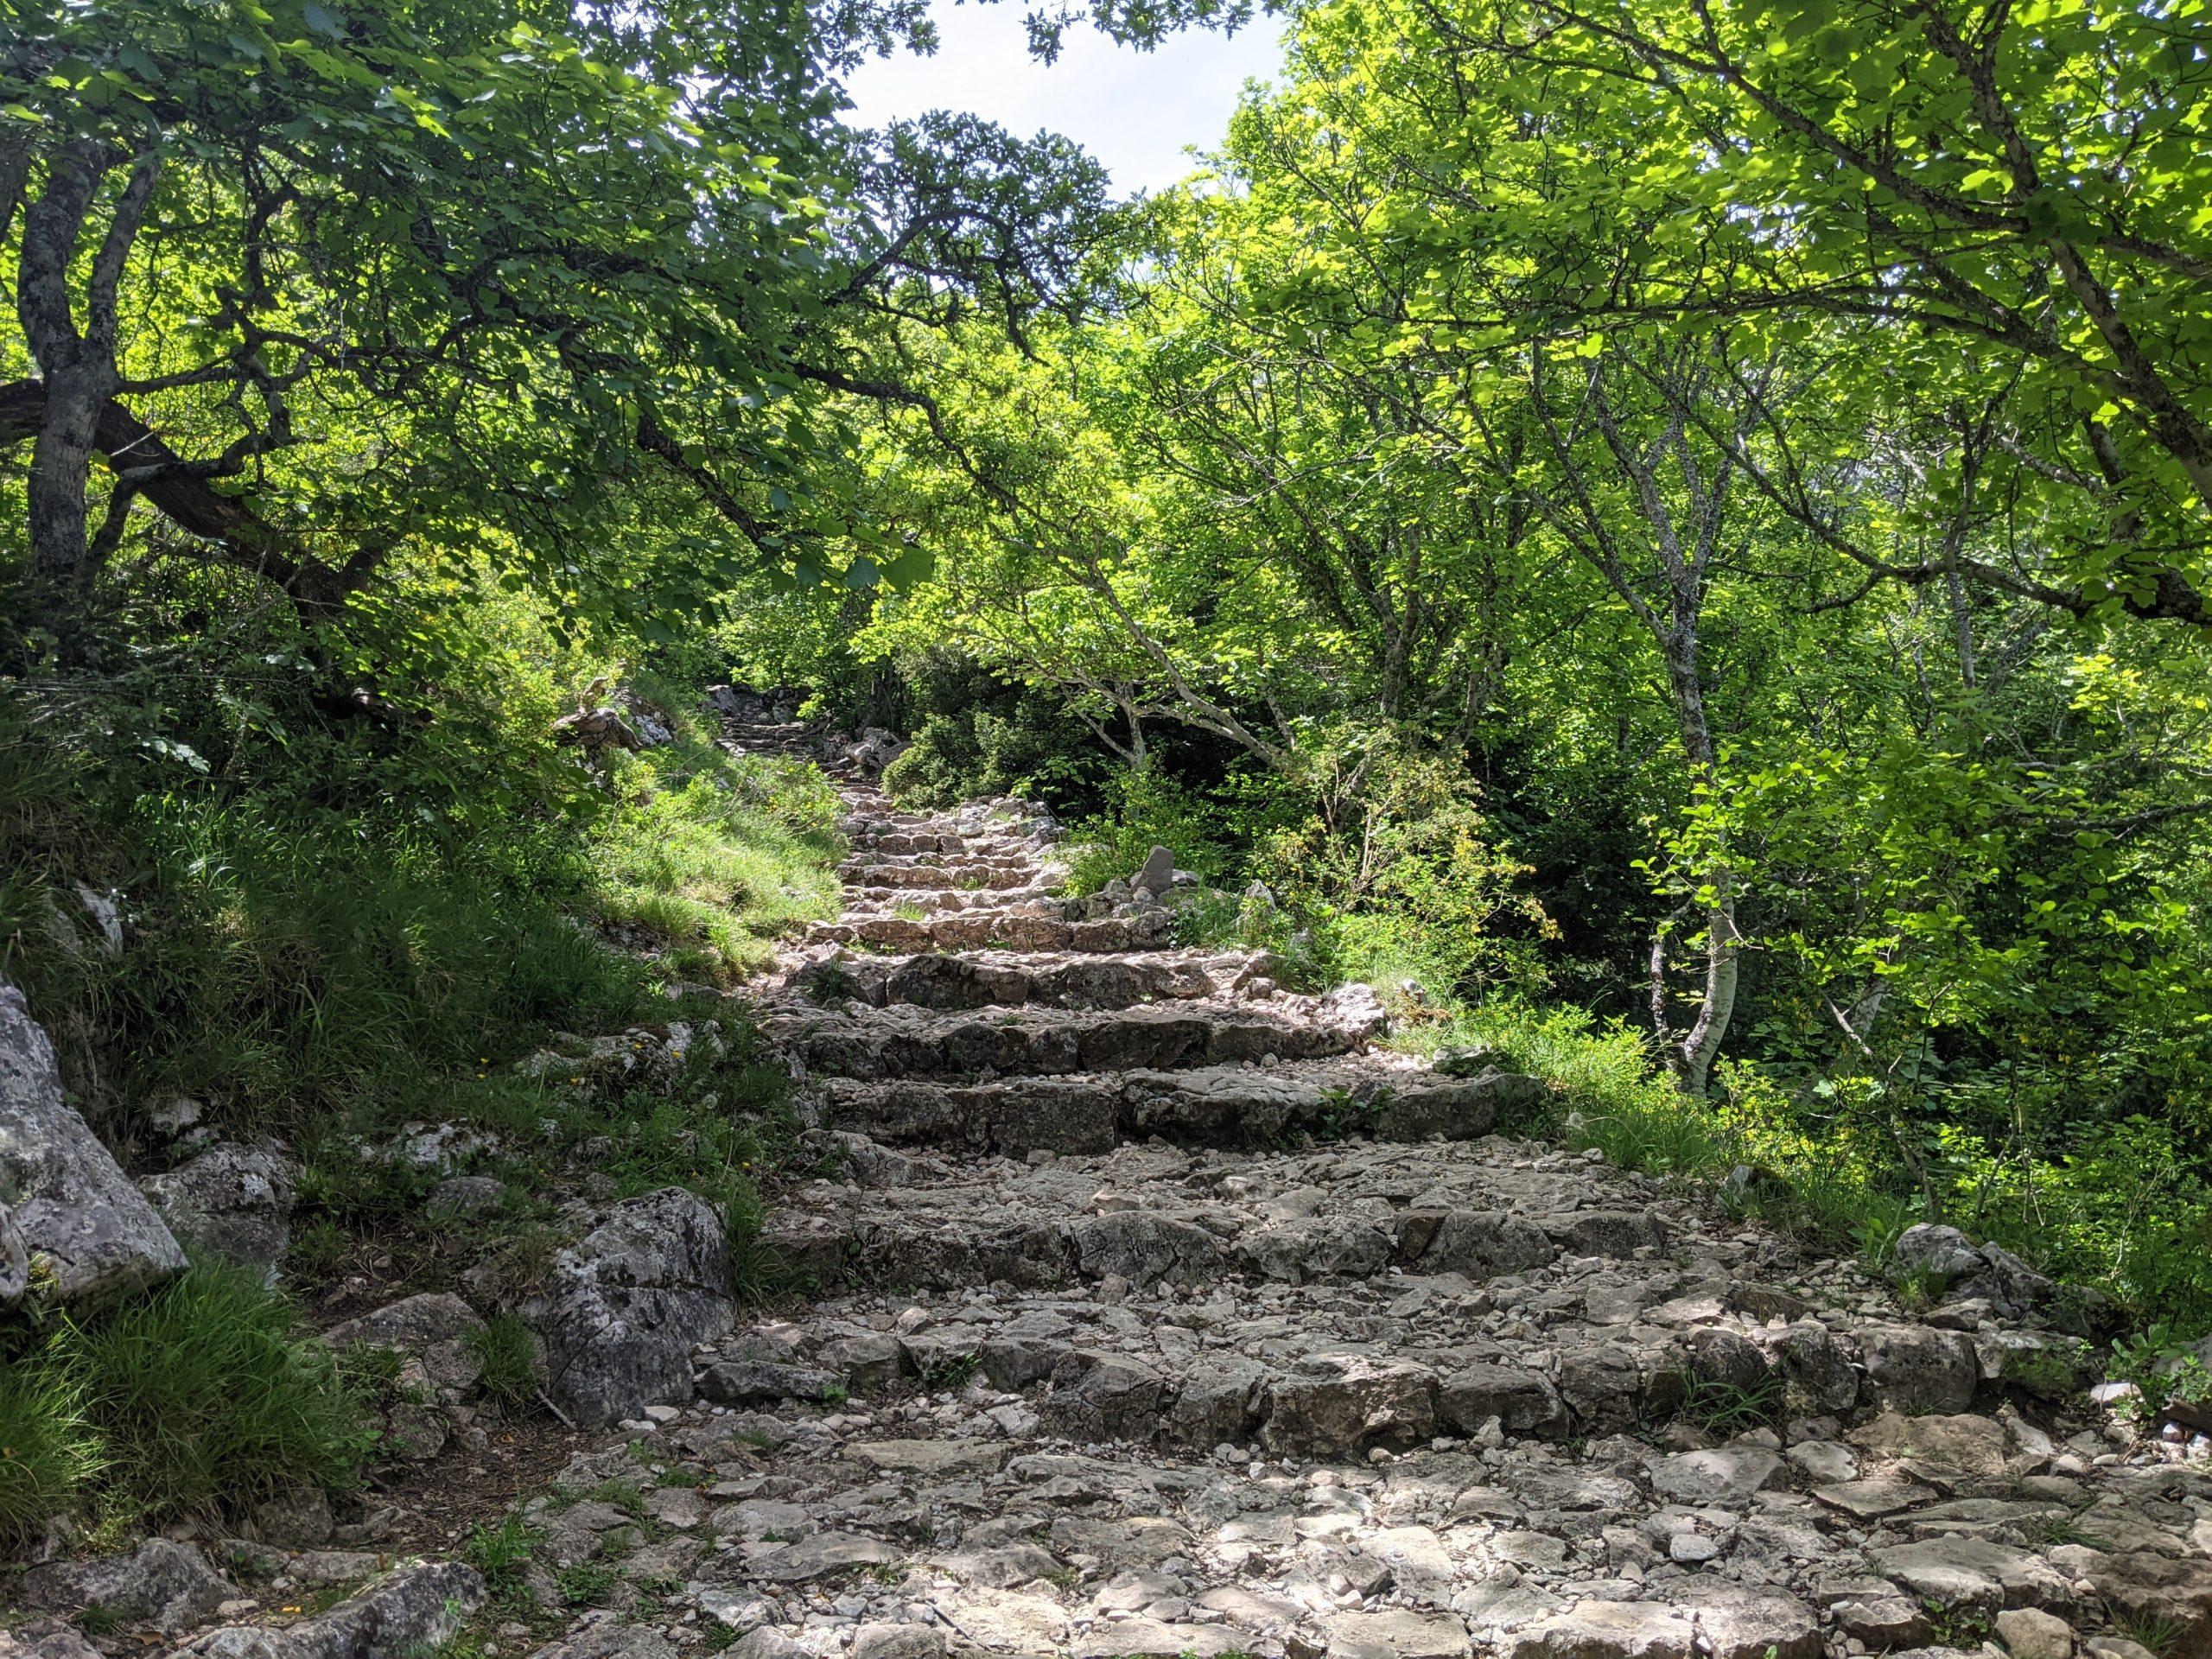 In the steps of Mary Magdalene - la Grotte de la Sainte Baume, France - MyFrenchLife.org